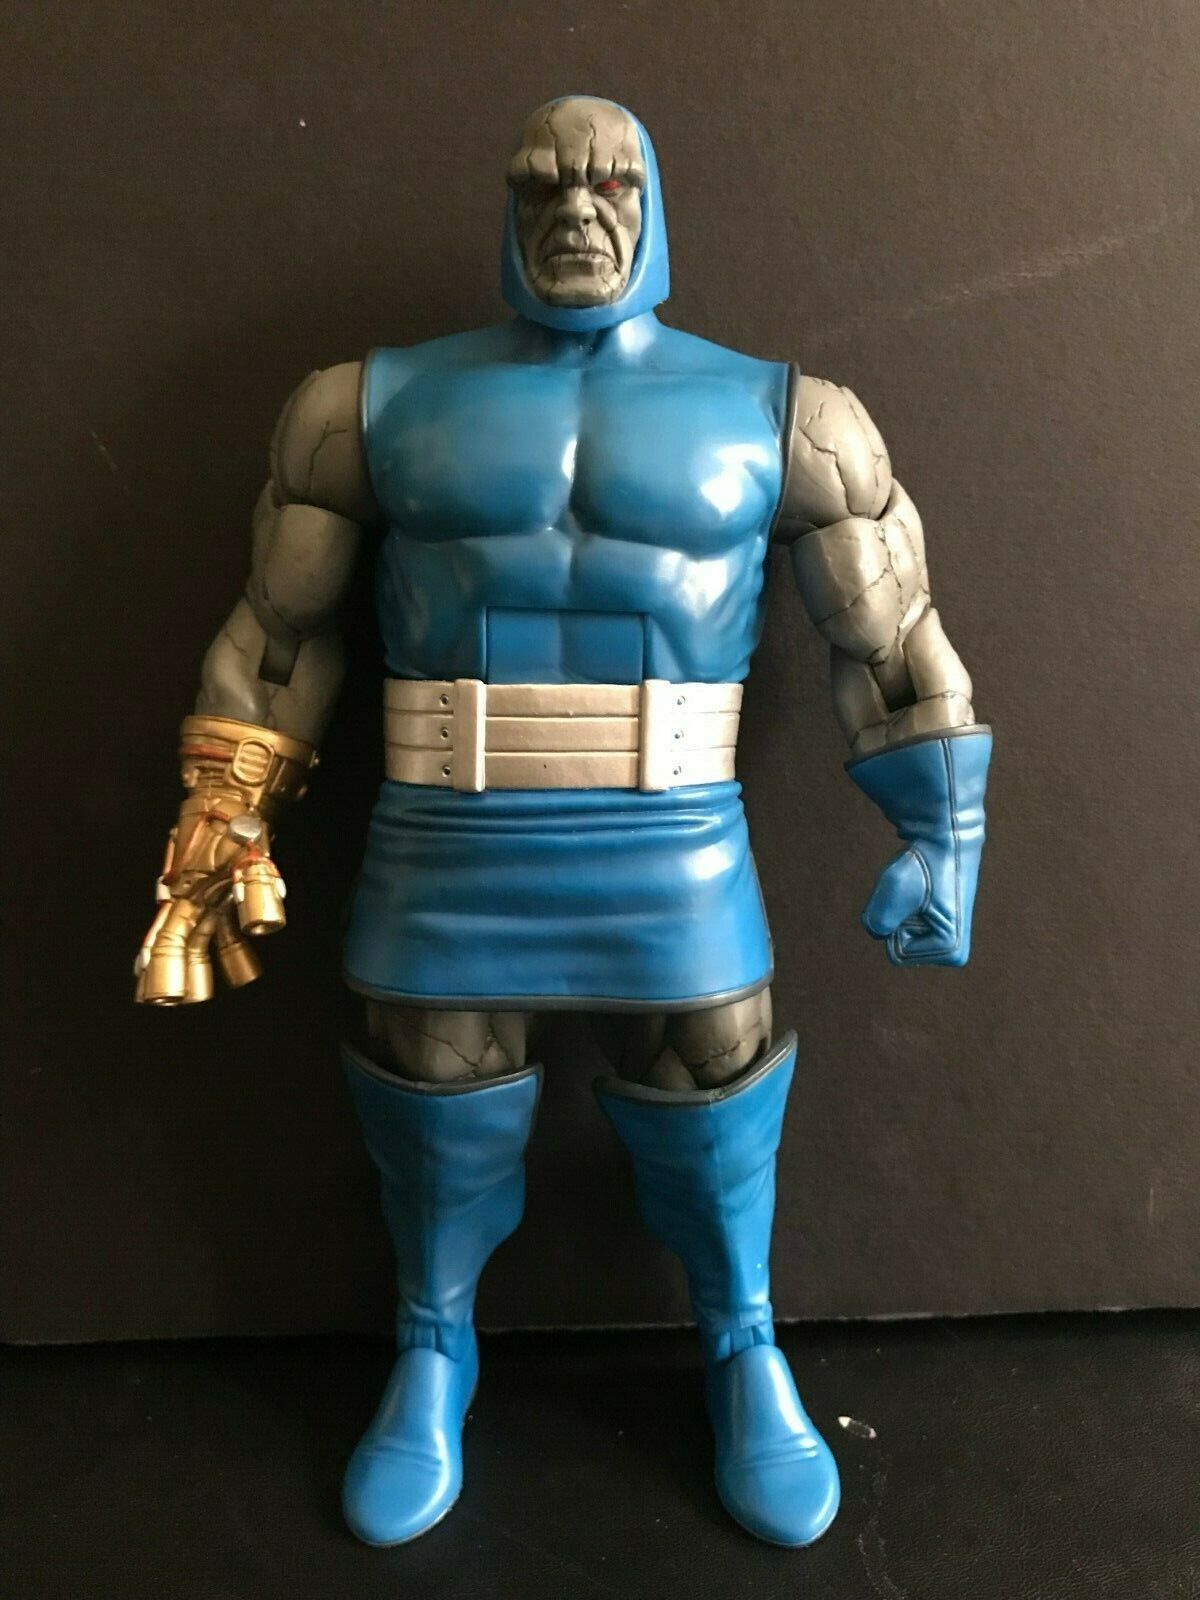 DC universo clásicos Darkseid Baf Completo Direct Figura súperman Batman Liga De La Justicia De América JSA